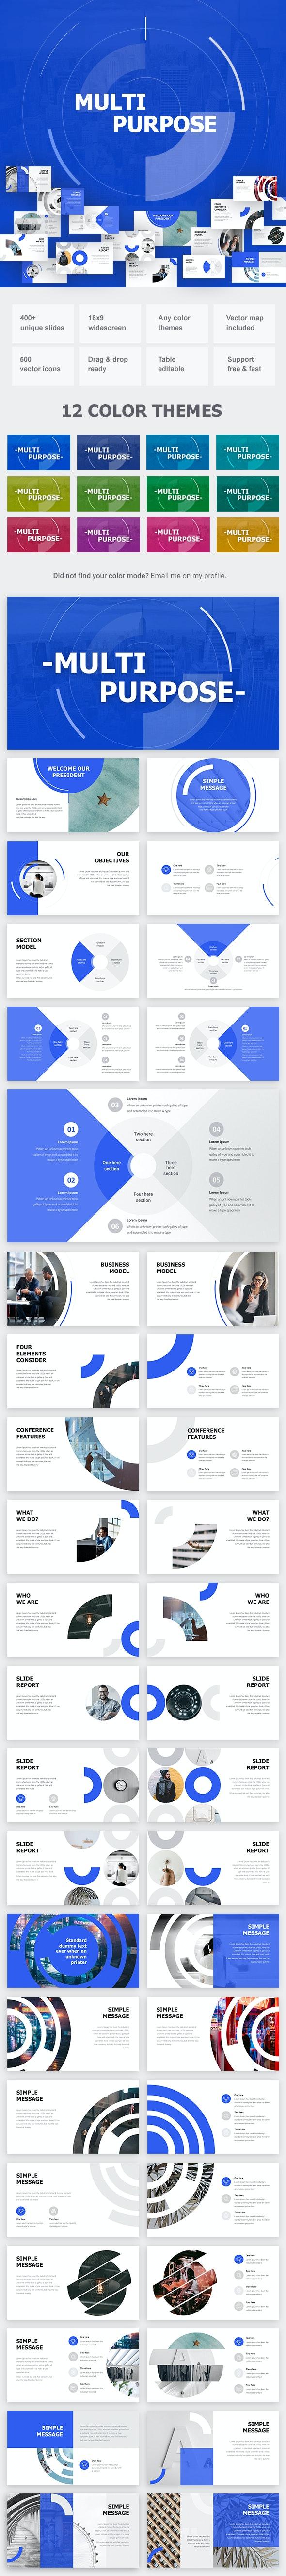 Multipurpose Powerpoint - Business PowerPoint Templates